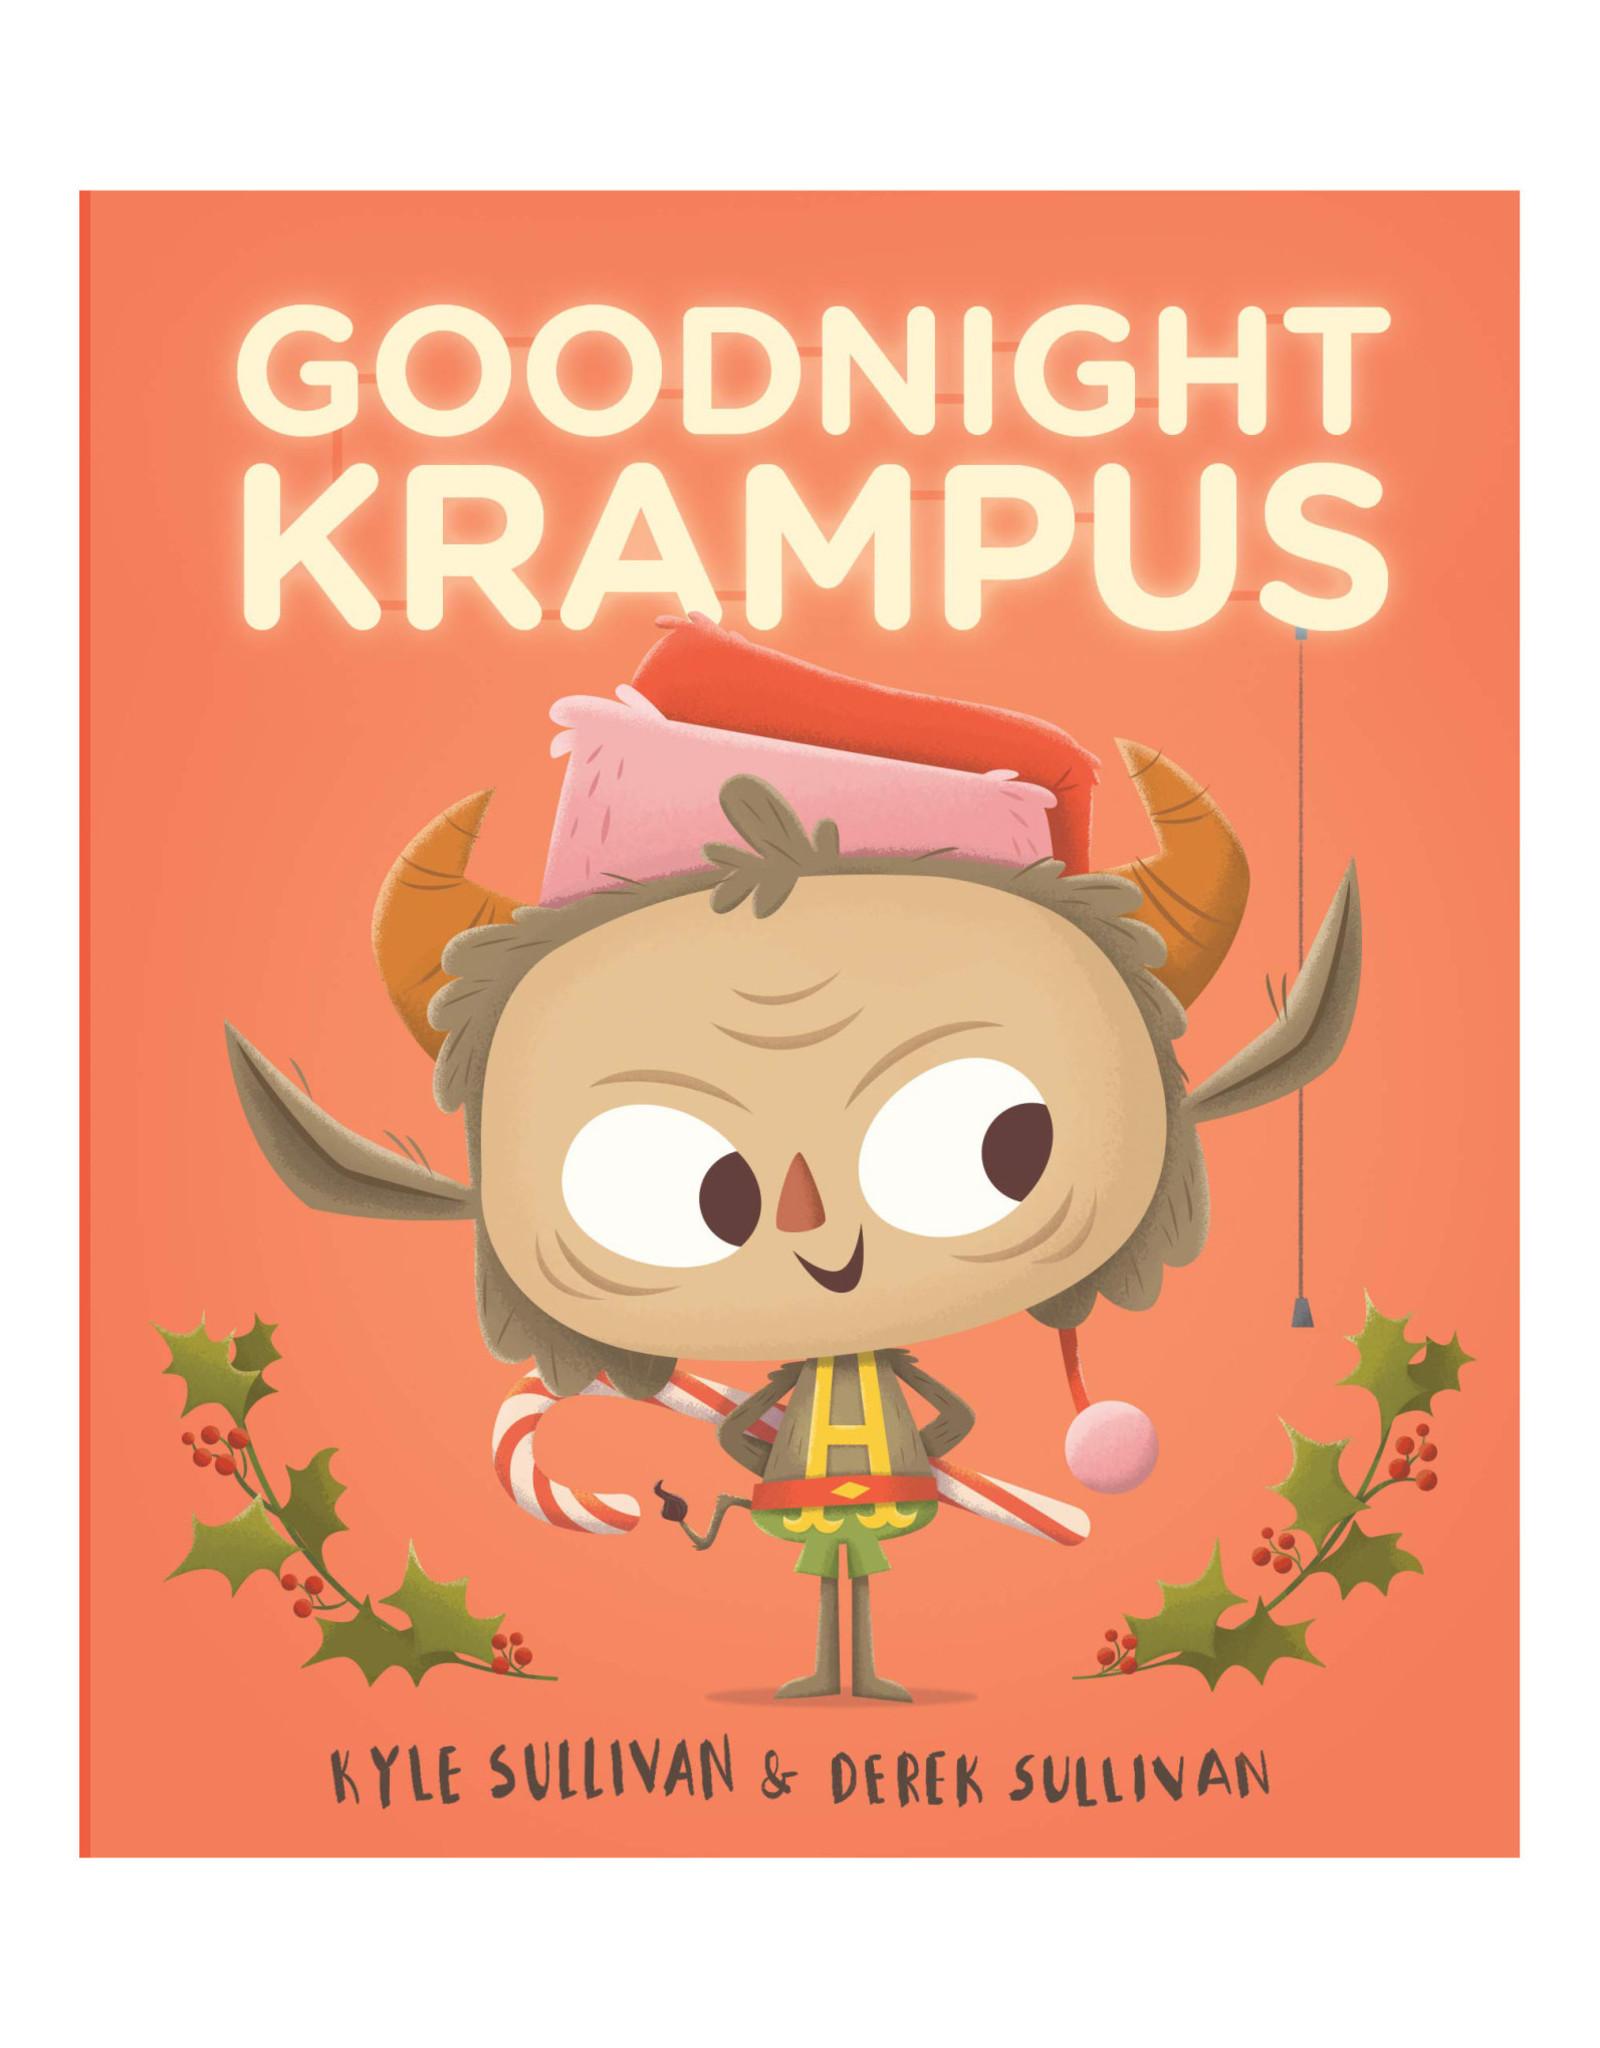 Goodnight Krampus